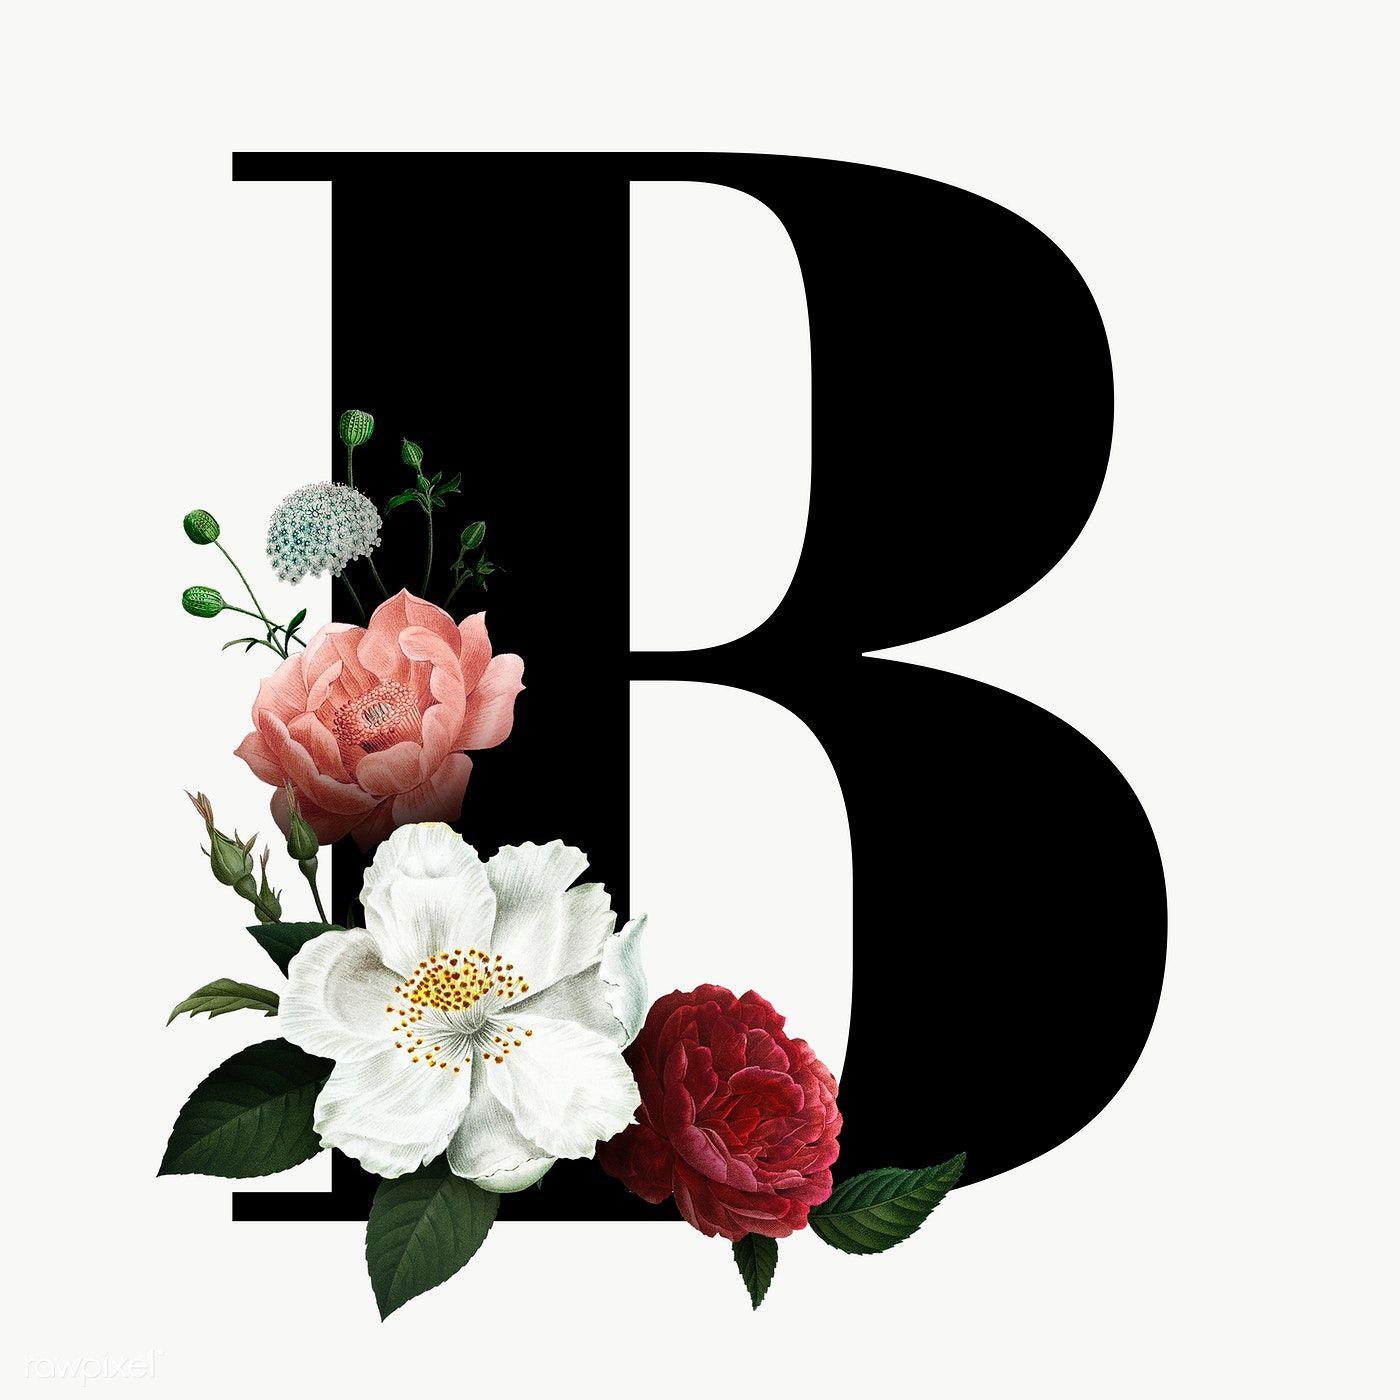 Classic And Elegant Floral Alphabet Font Letter B Transparent Png Free Image By Rawpixel Com Manotang Fonts Alphabet Floral Font Lettering Alphabet Fonts